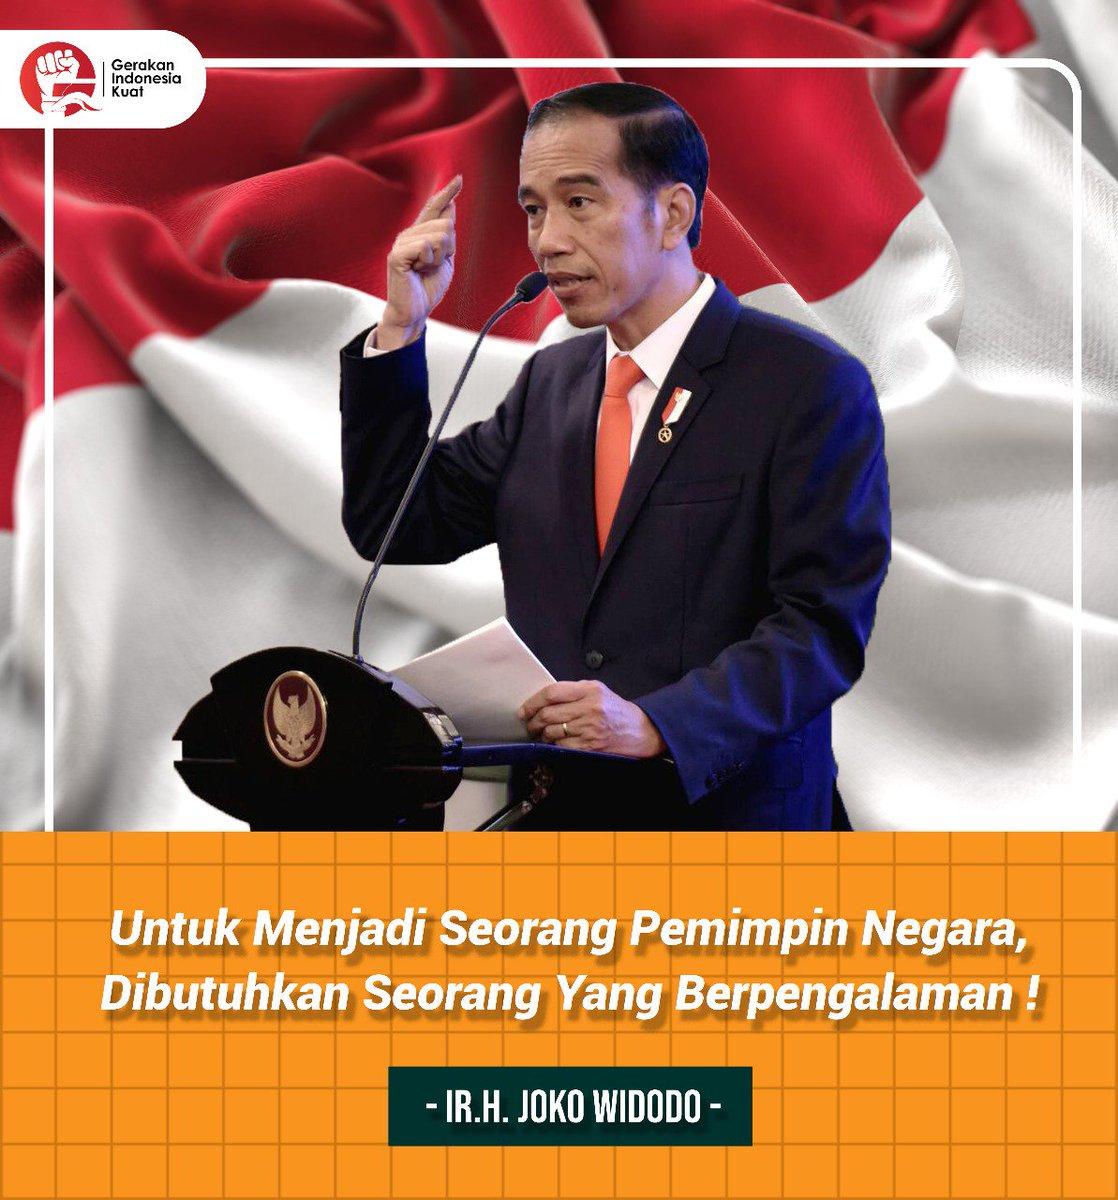 #jokowipresidenku #rekanjokowi #rekanjokowisulsel #ayoteruskerja #indonesiakuat https://t.co/jwcs8pVnJz